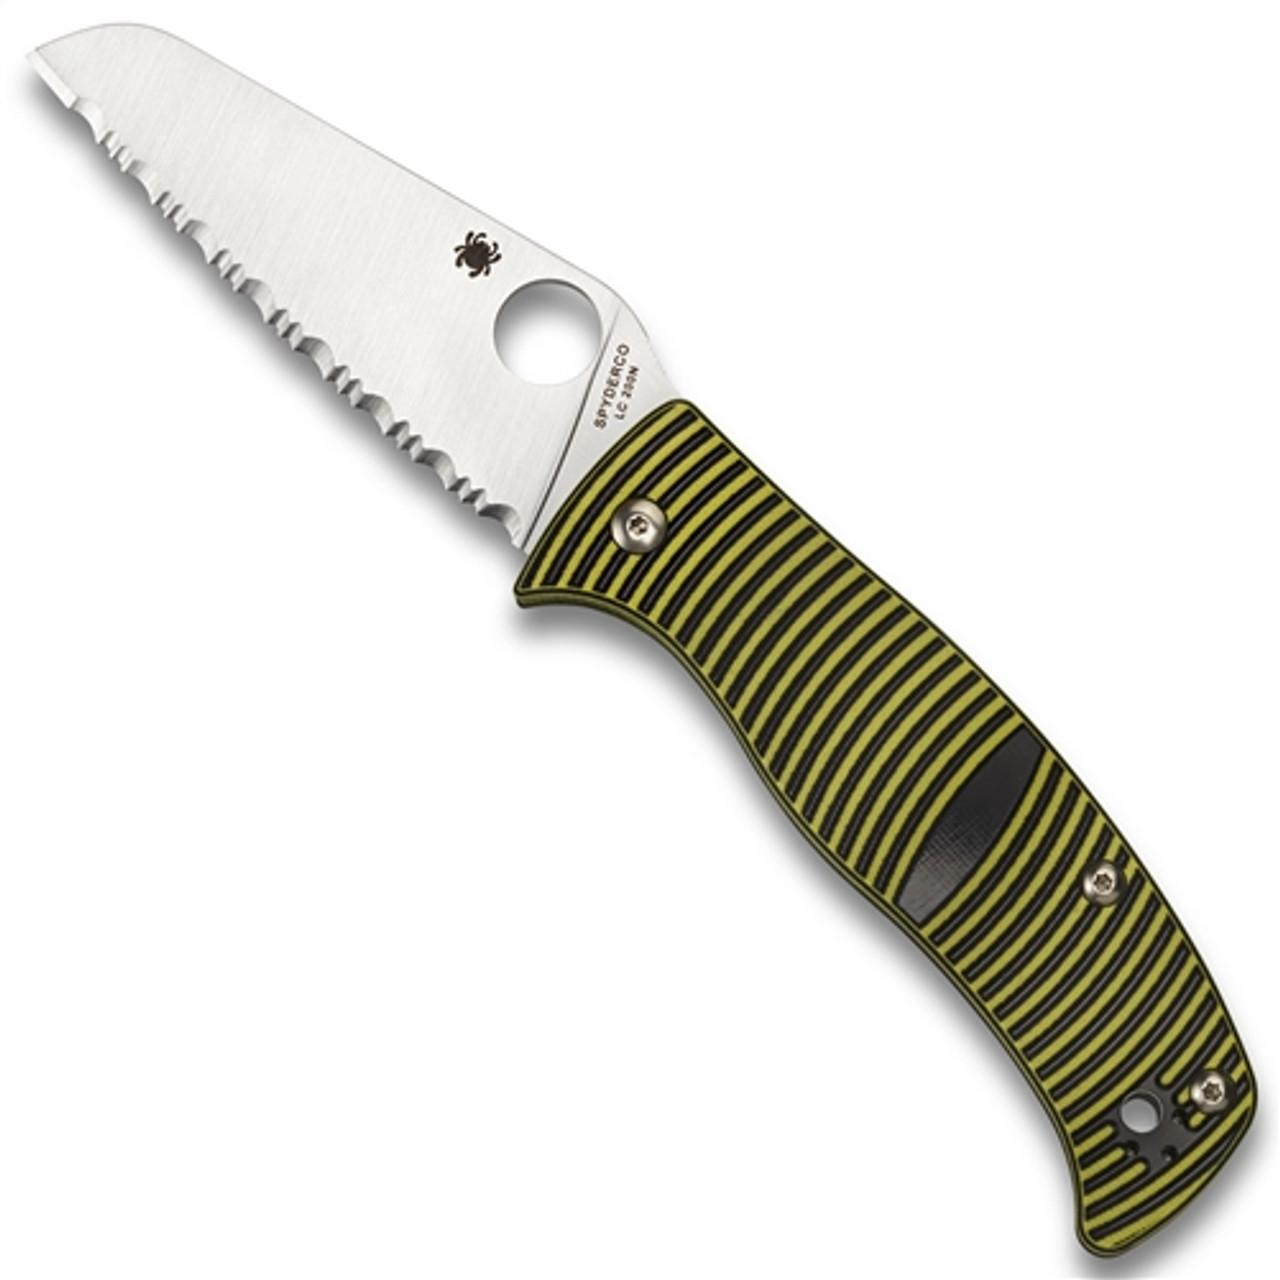 Spyderco C217GSSF Black/Yellow Caribbean Sheepsfoot Folder Knife, LC200N Satin SpyderEdge Blade